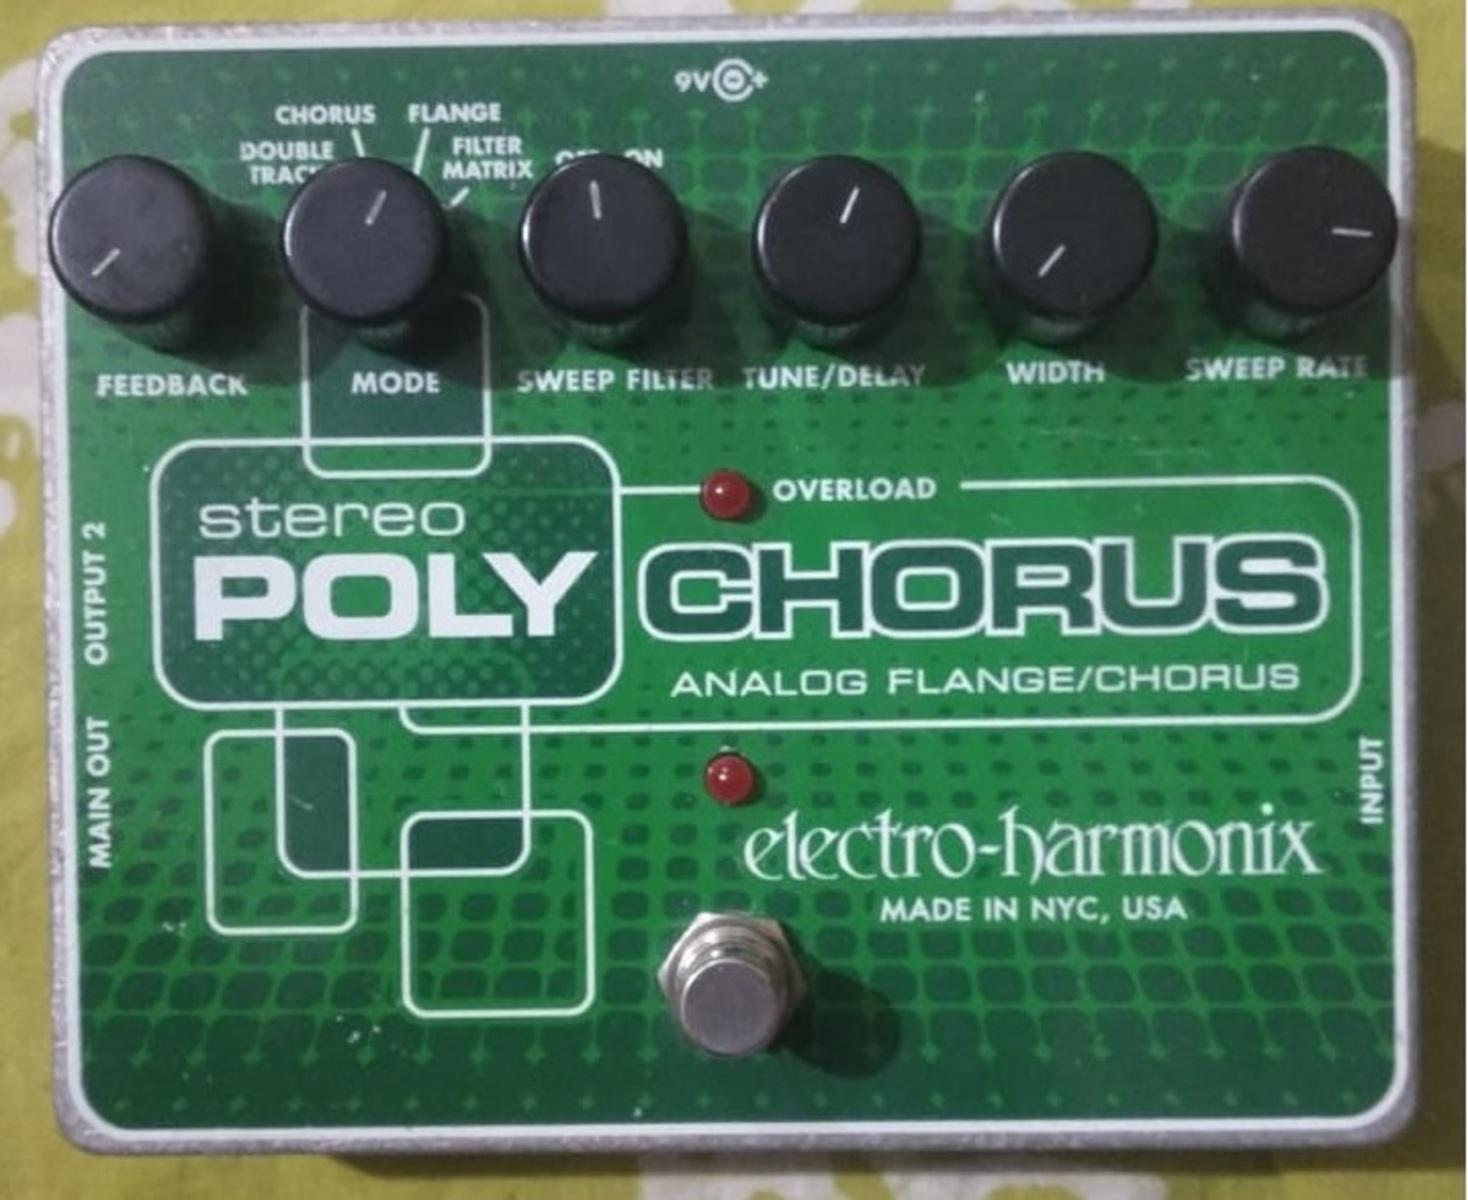 Photo of Electro-Harmonix Stereo Polychorus in a closeup